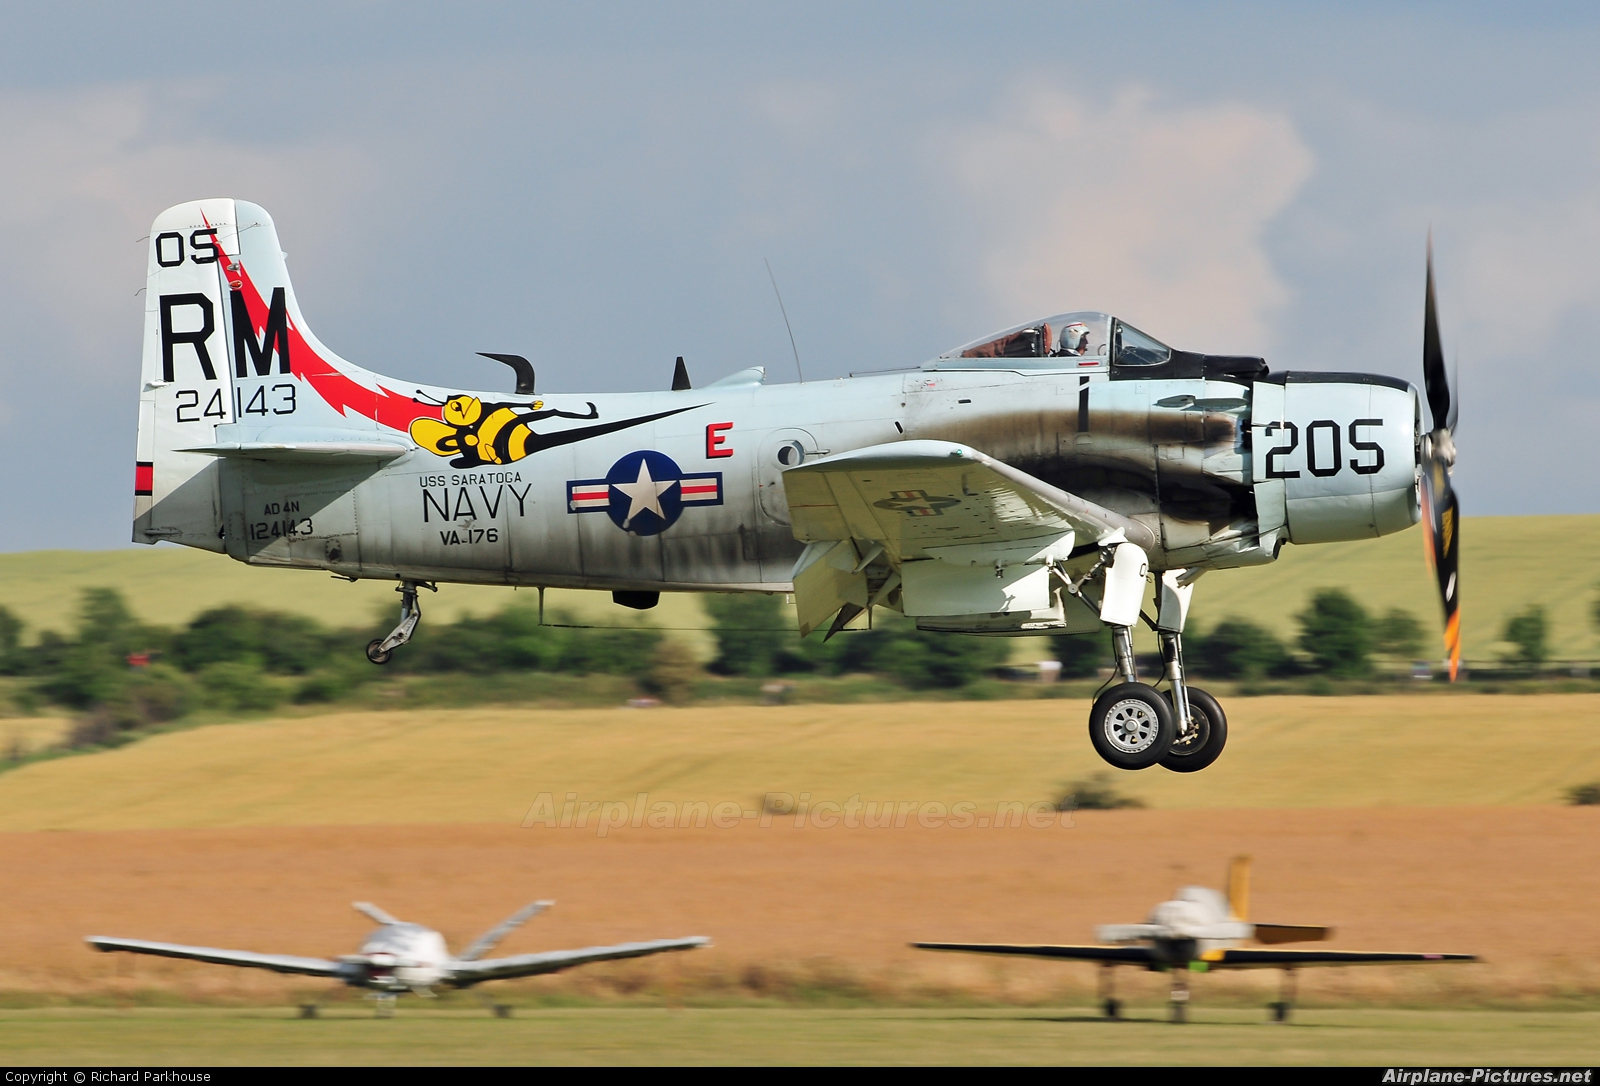 Amicale Jean Salis F-AZDP aircraft at Duxford